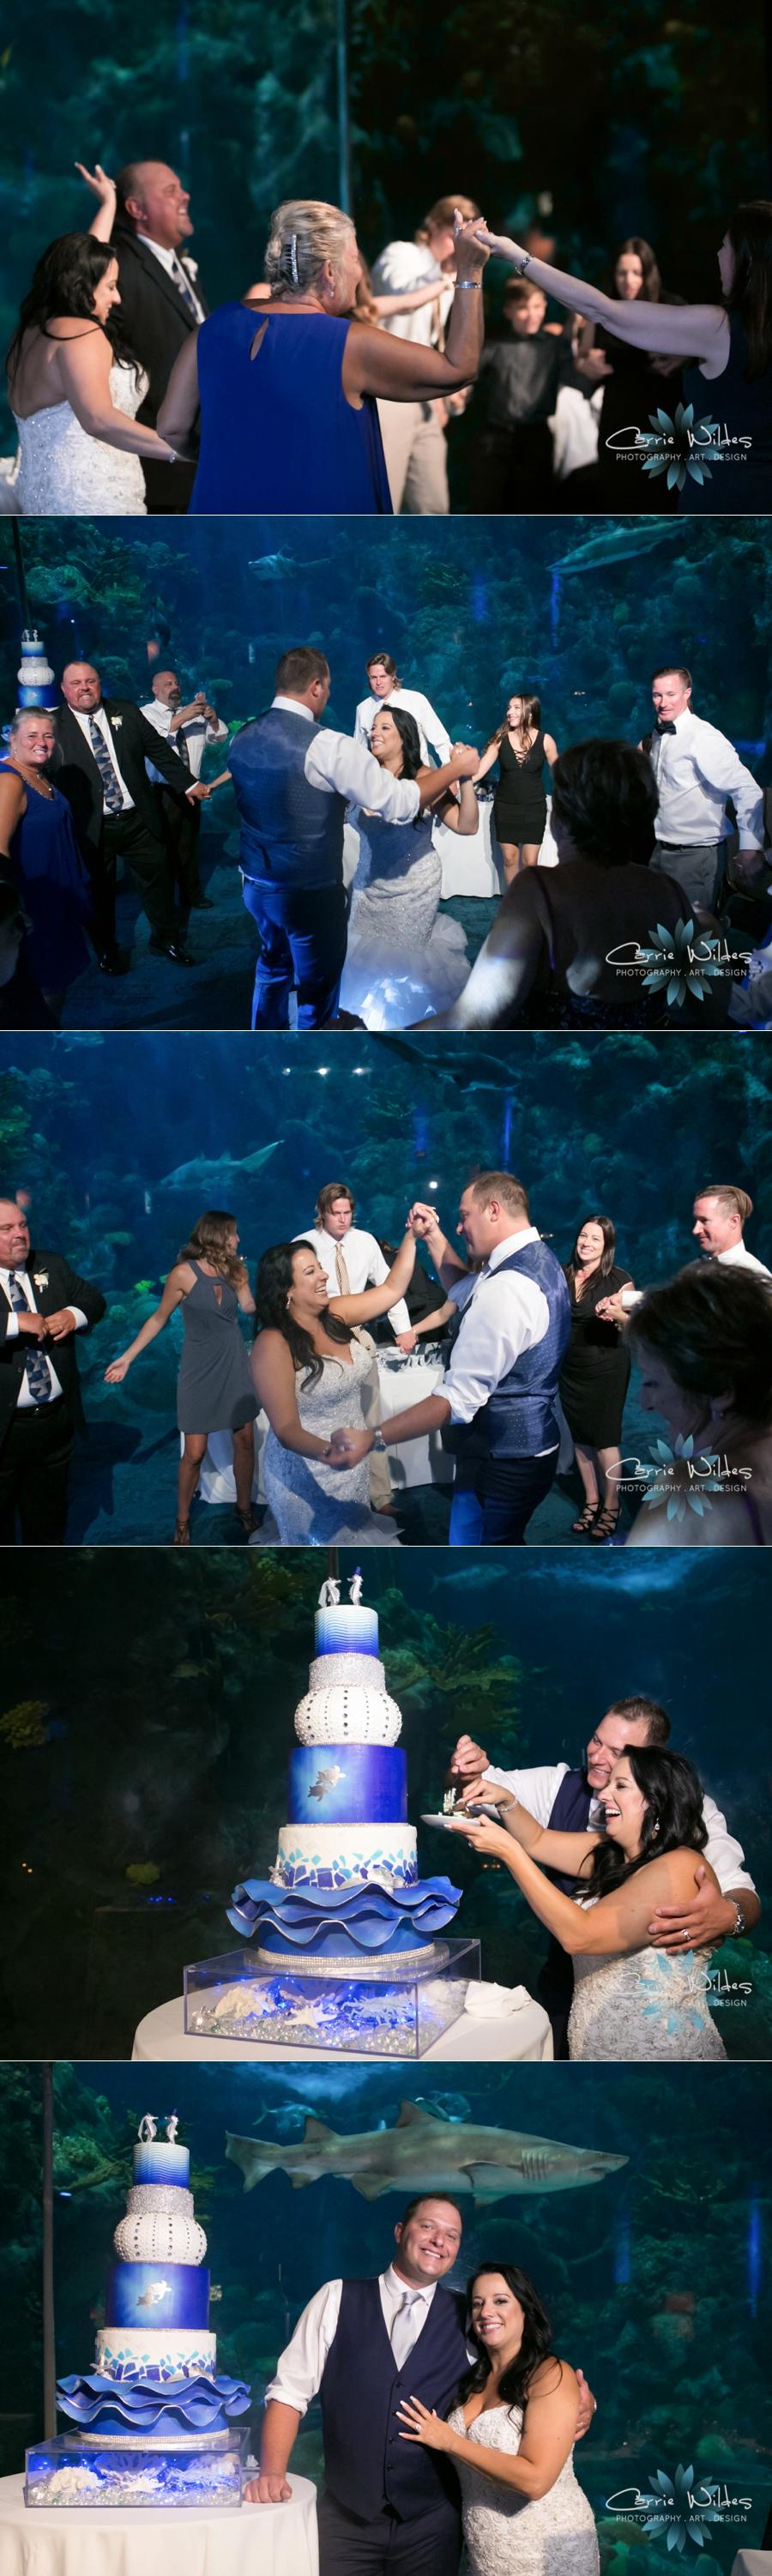 10_20_18 Donna and Drew The Florida Aquarium Wedding_0038.jpg